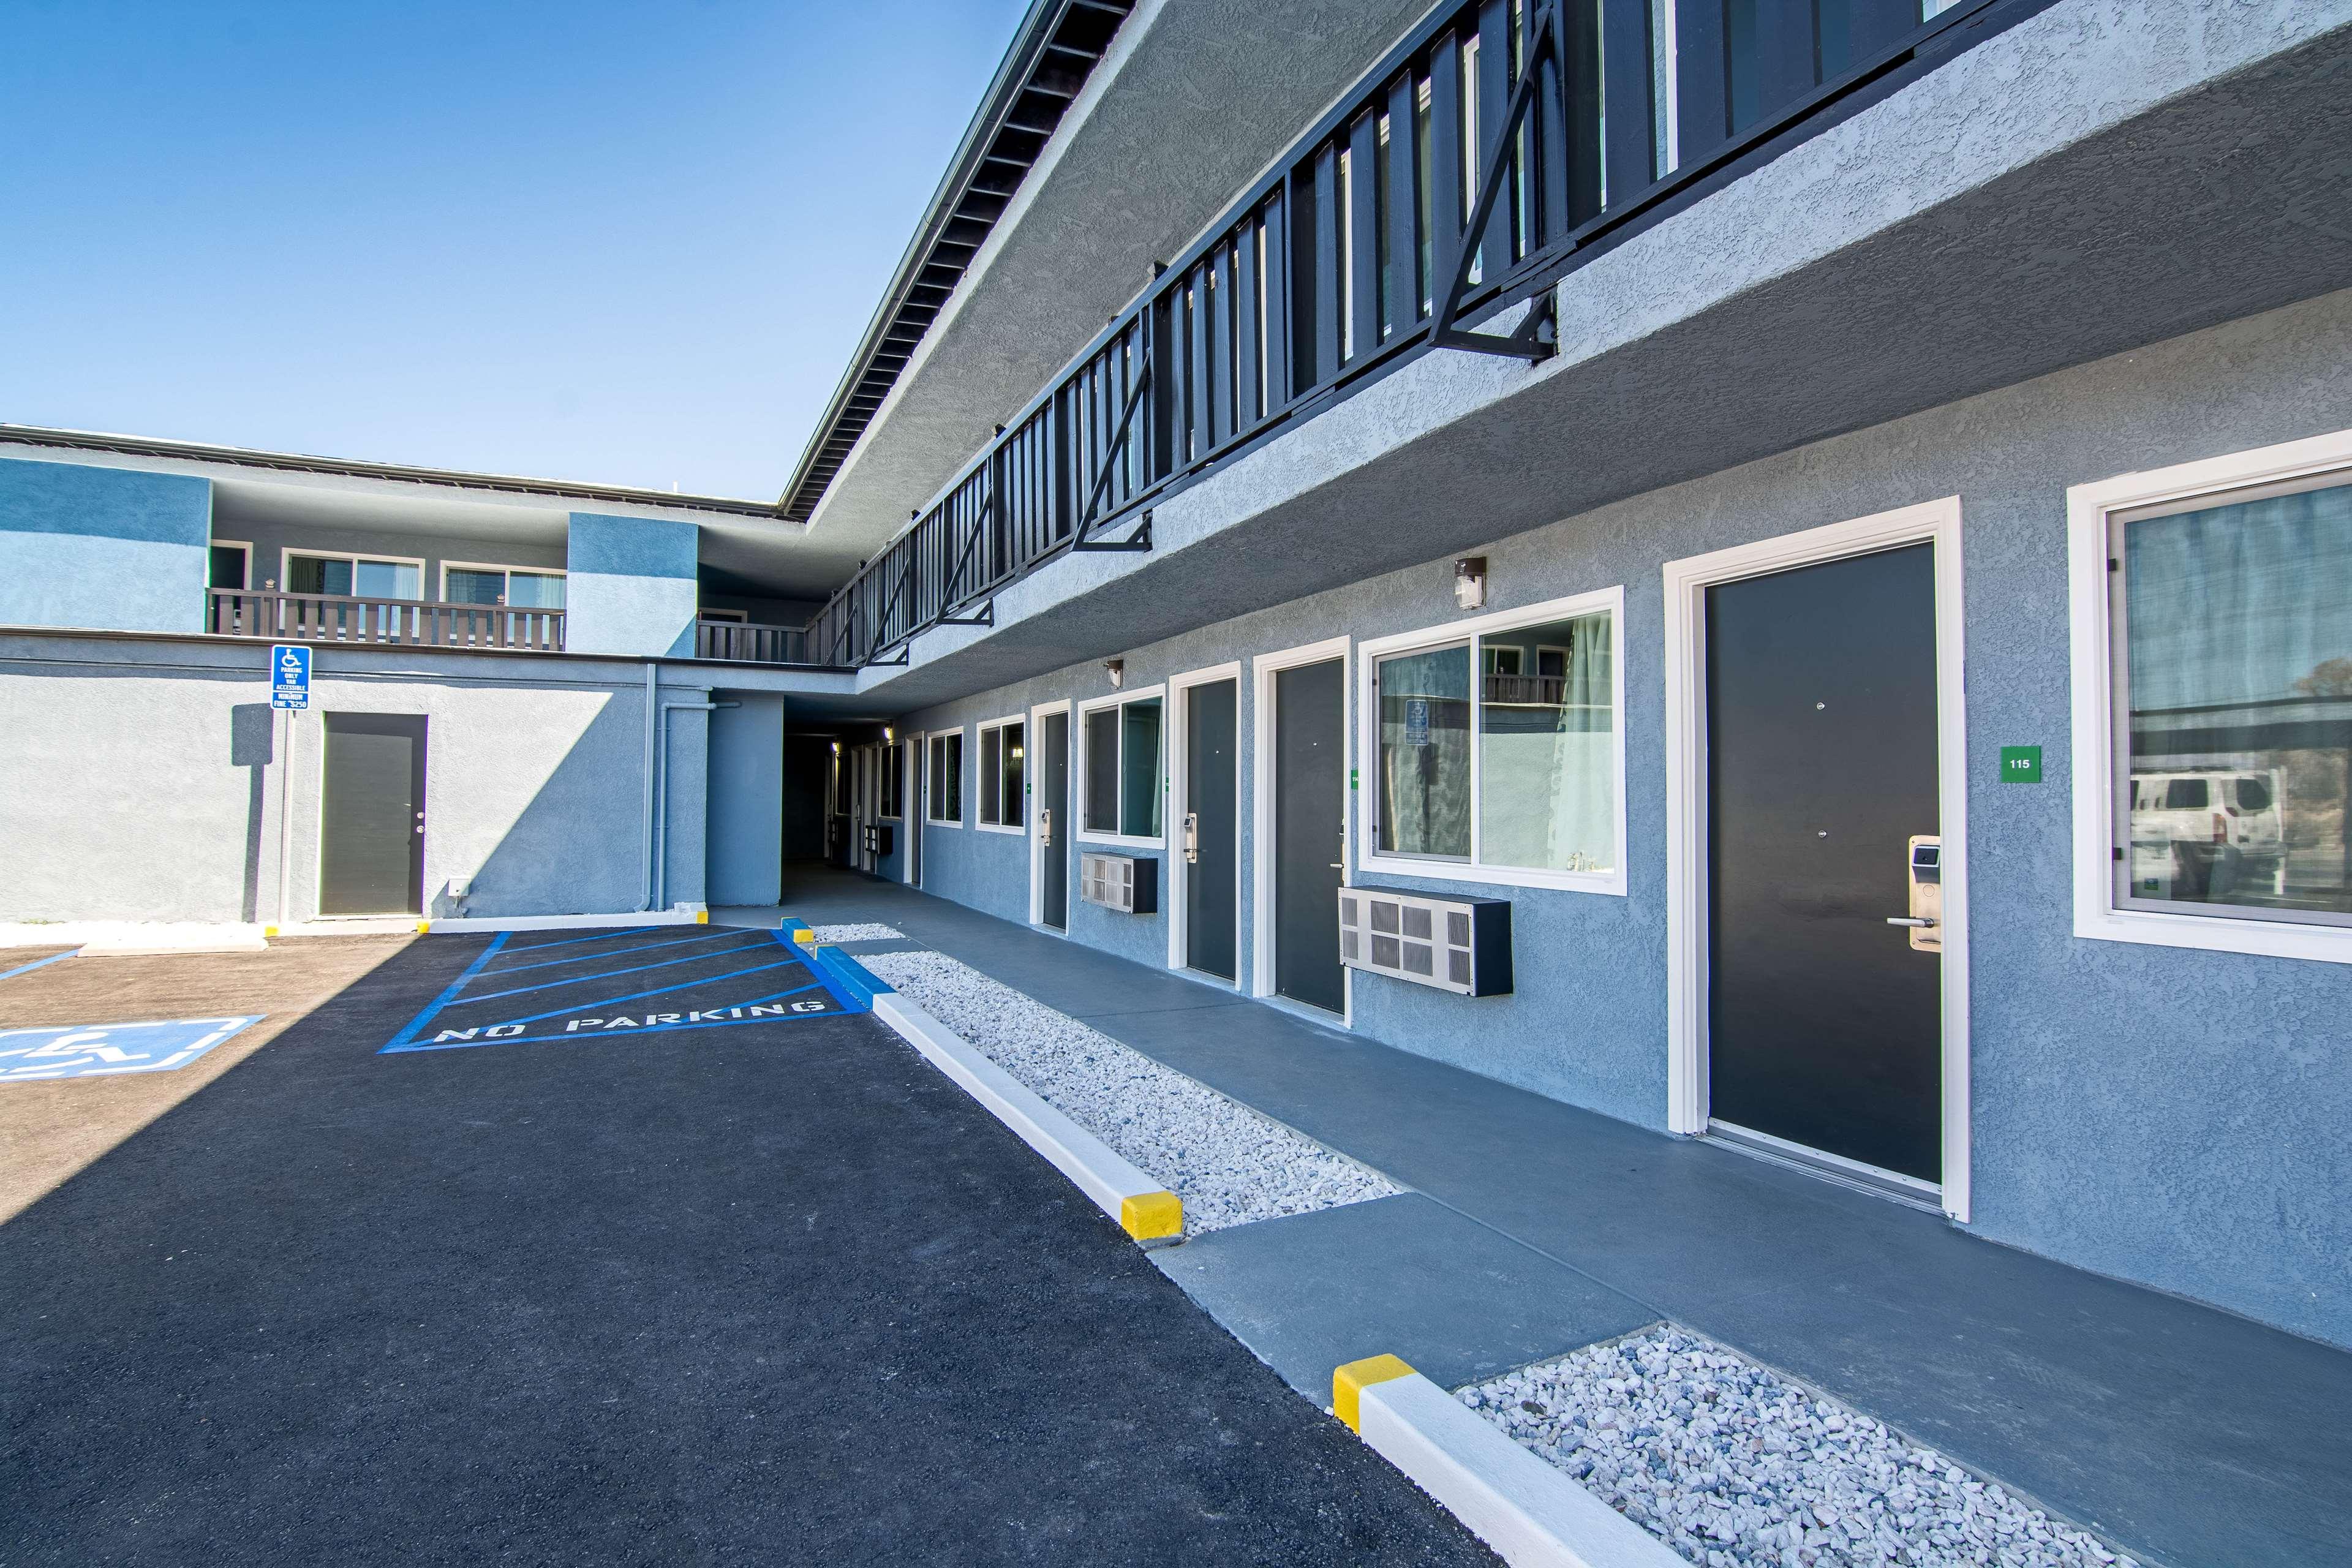 SureStay Hotel by Best Western Ridgecrest image 15